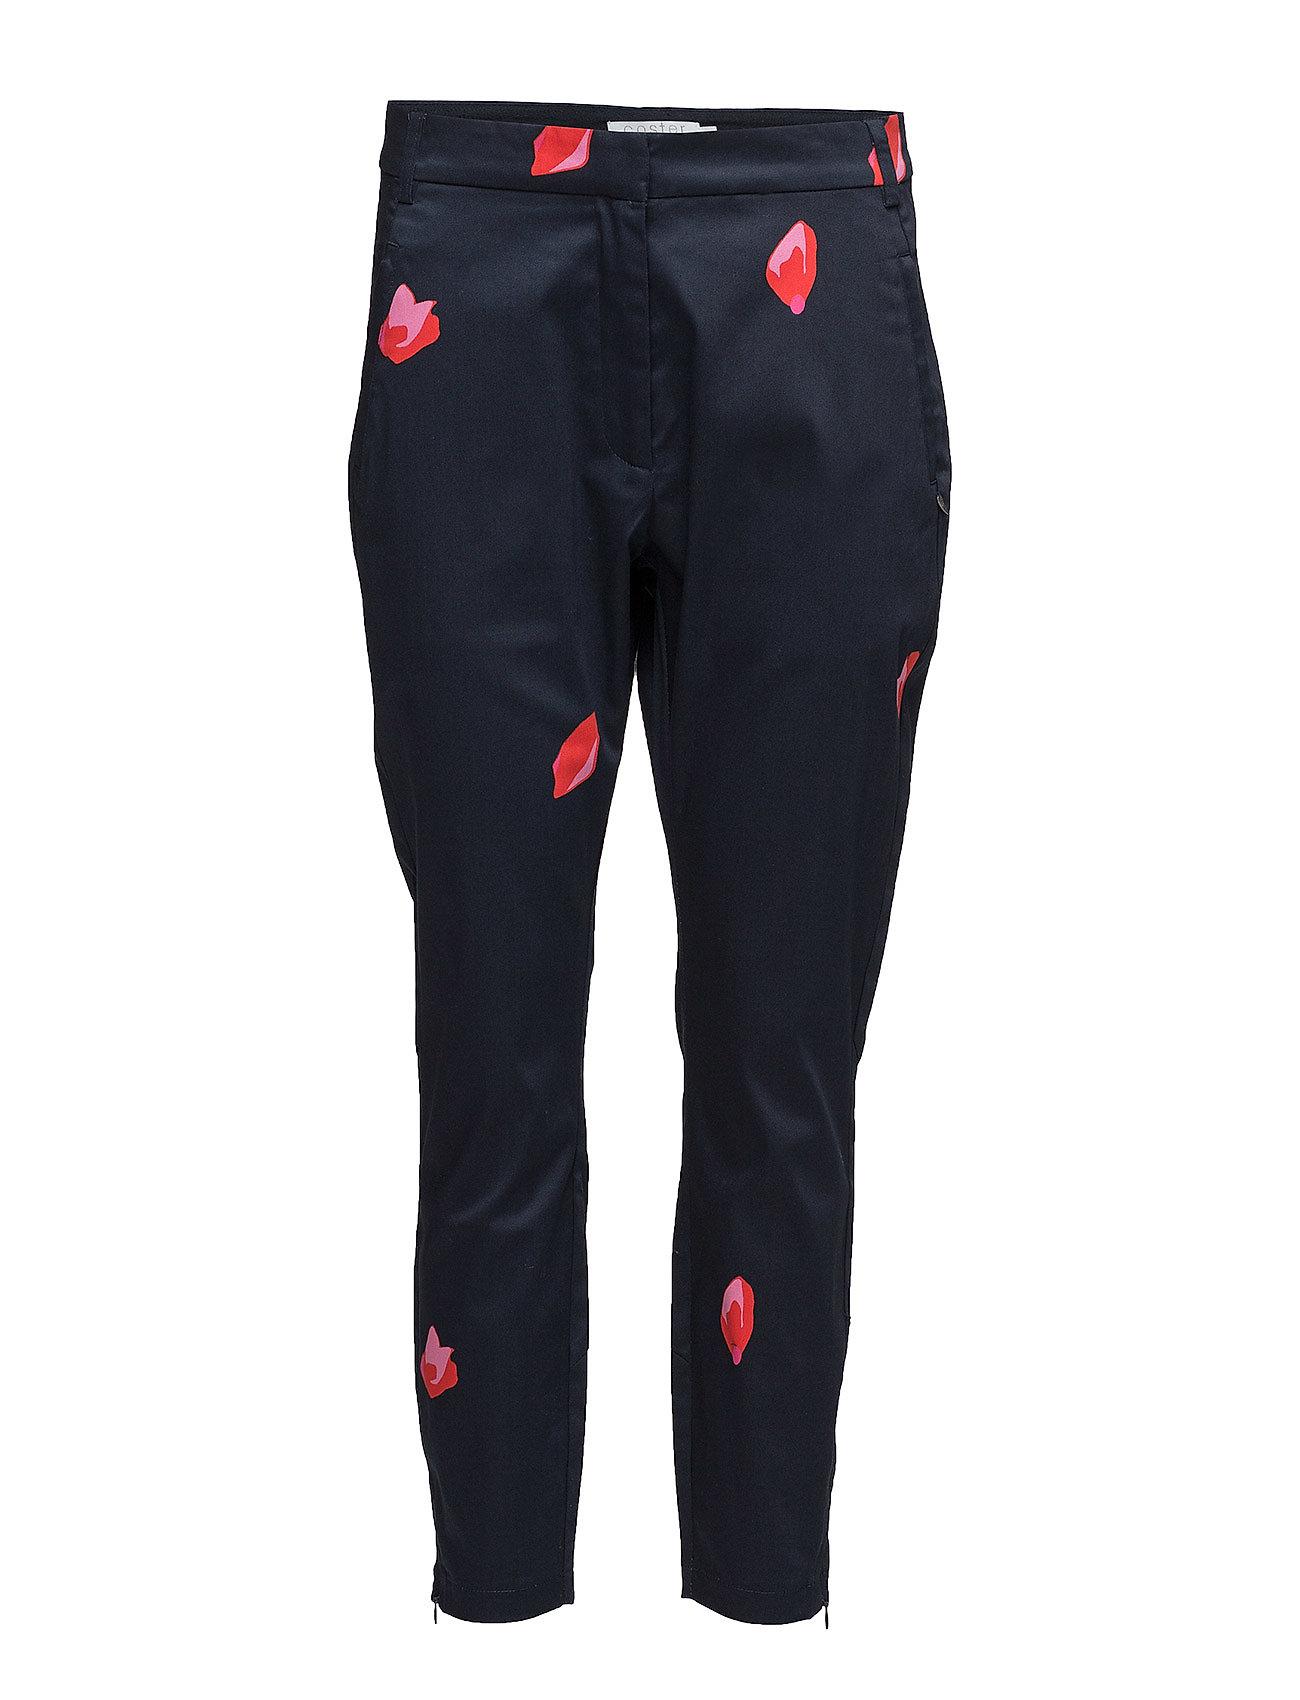 Coster Copenhagen Trousers w. Blot print